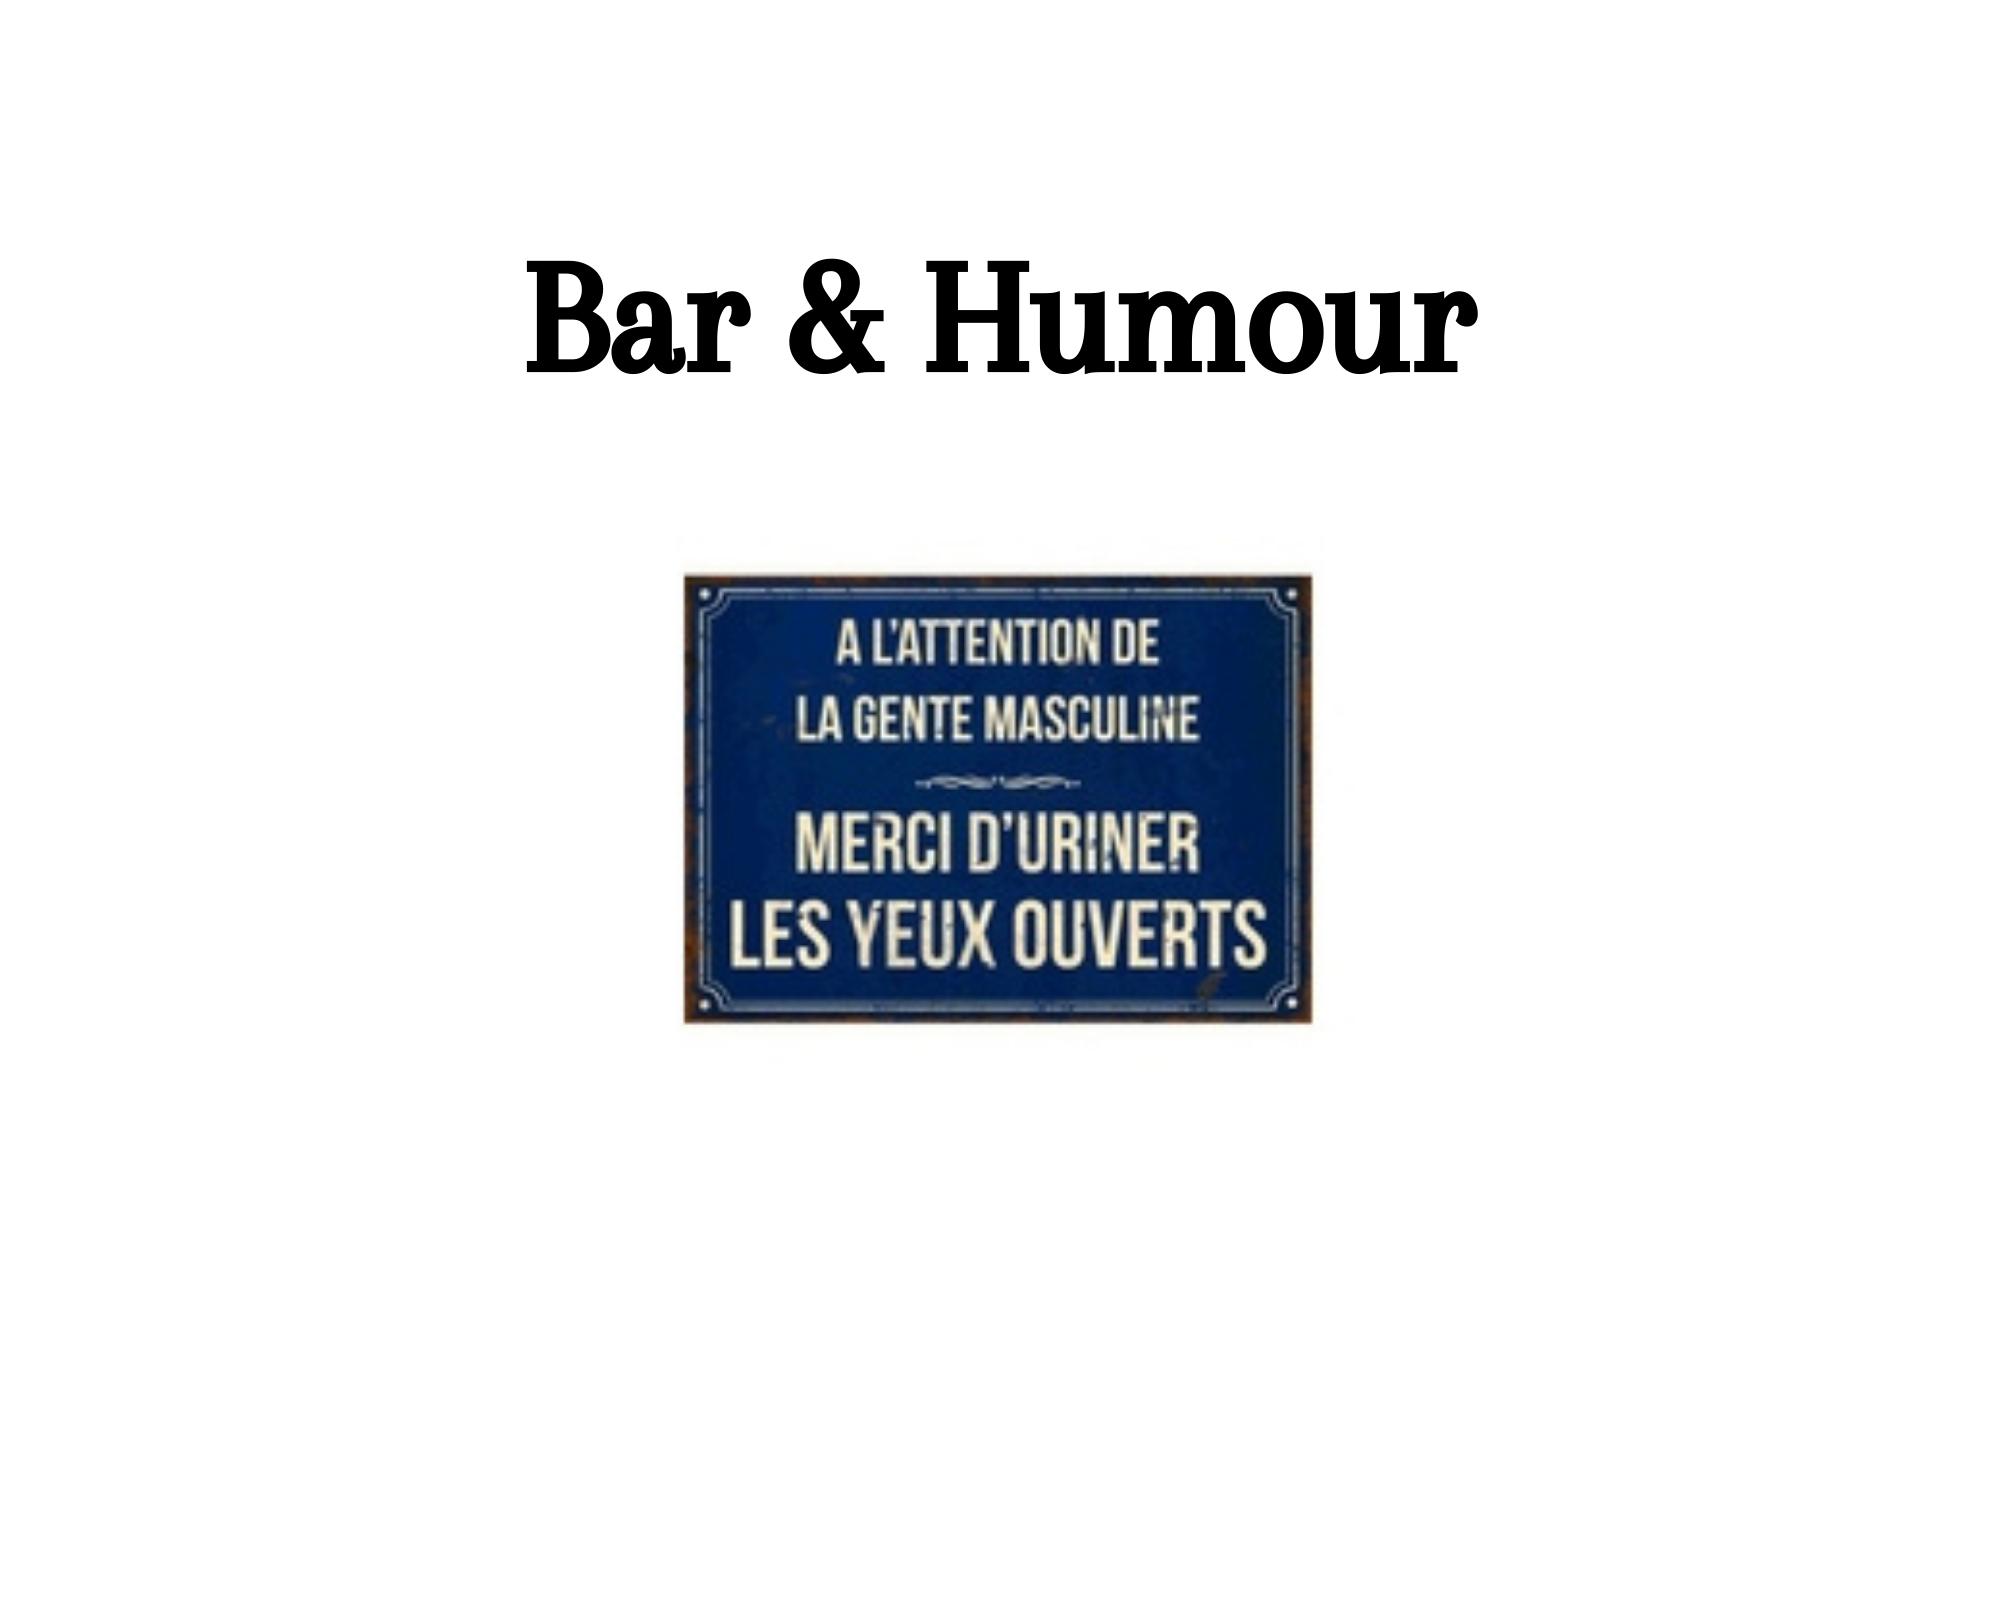 Bar & humour